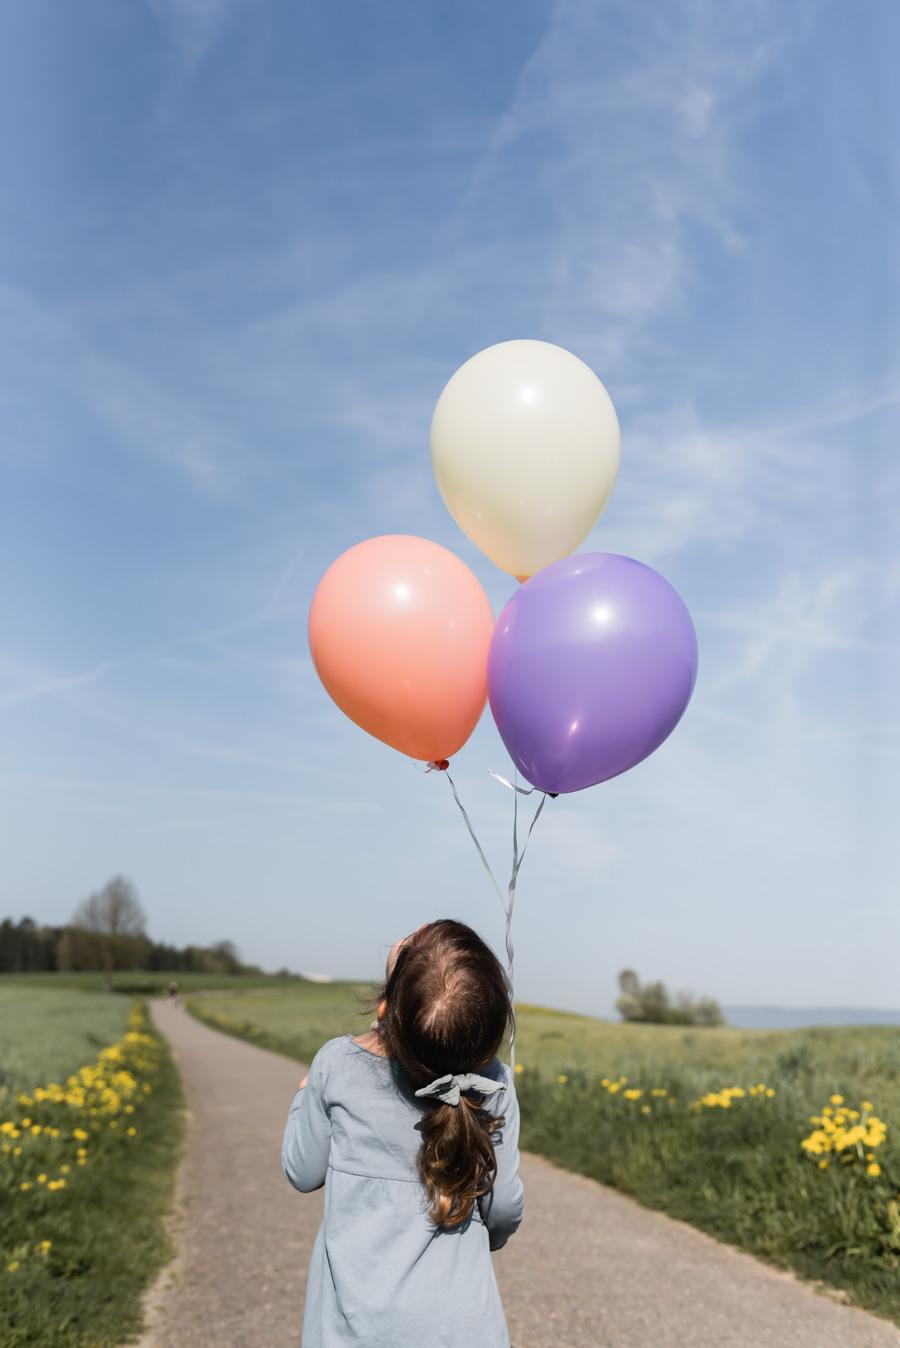 Celebrate together: beautiful birthday rituals for children #children's birthday #birthday rituals #birthday